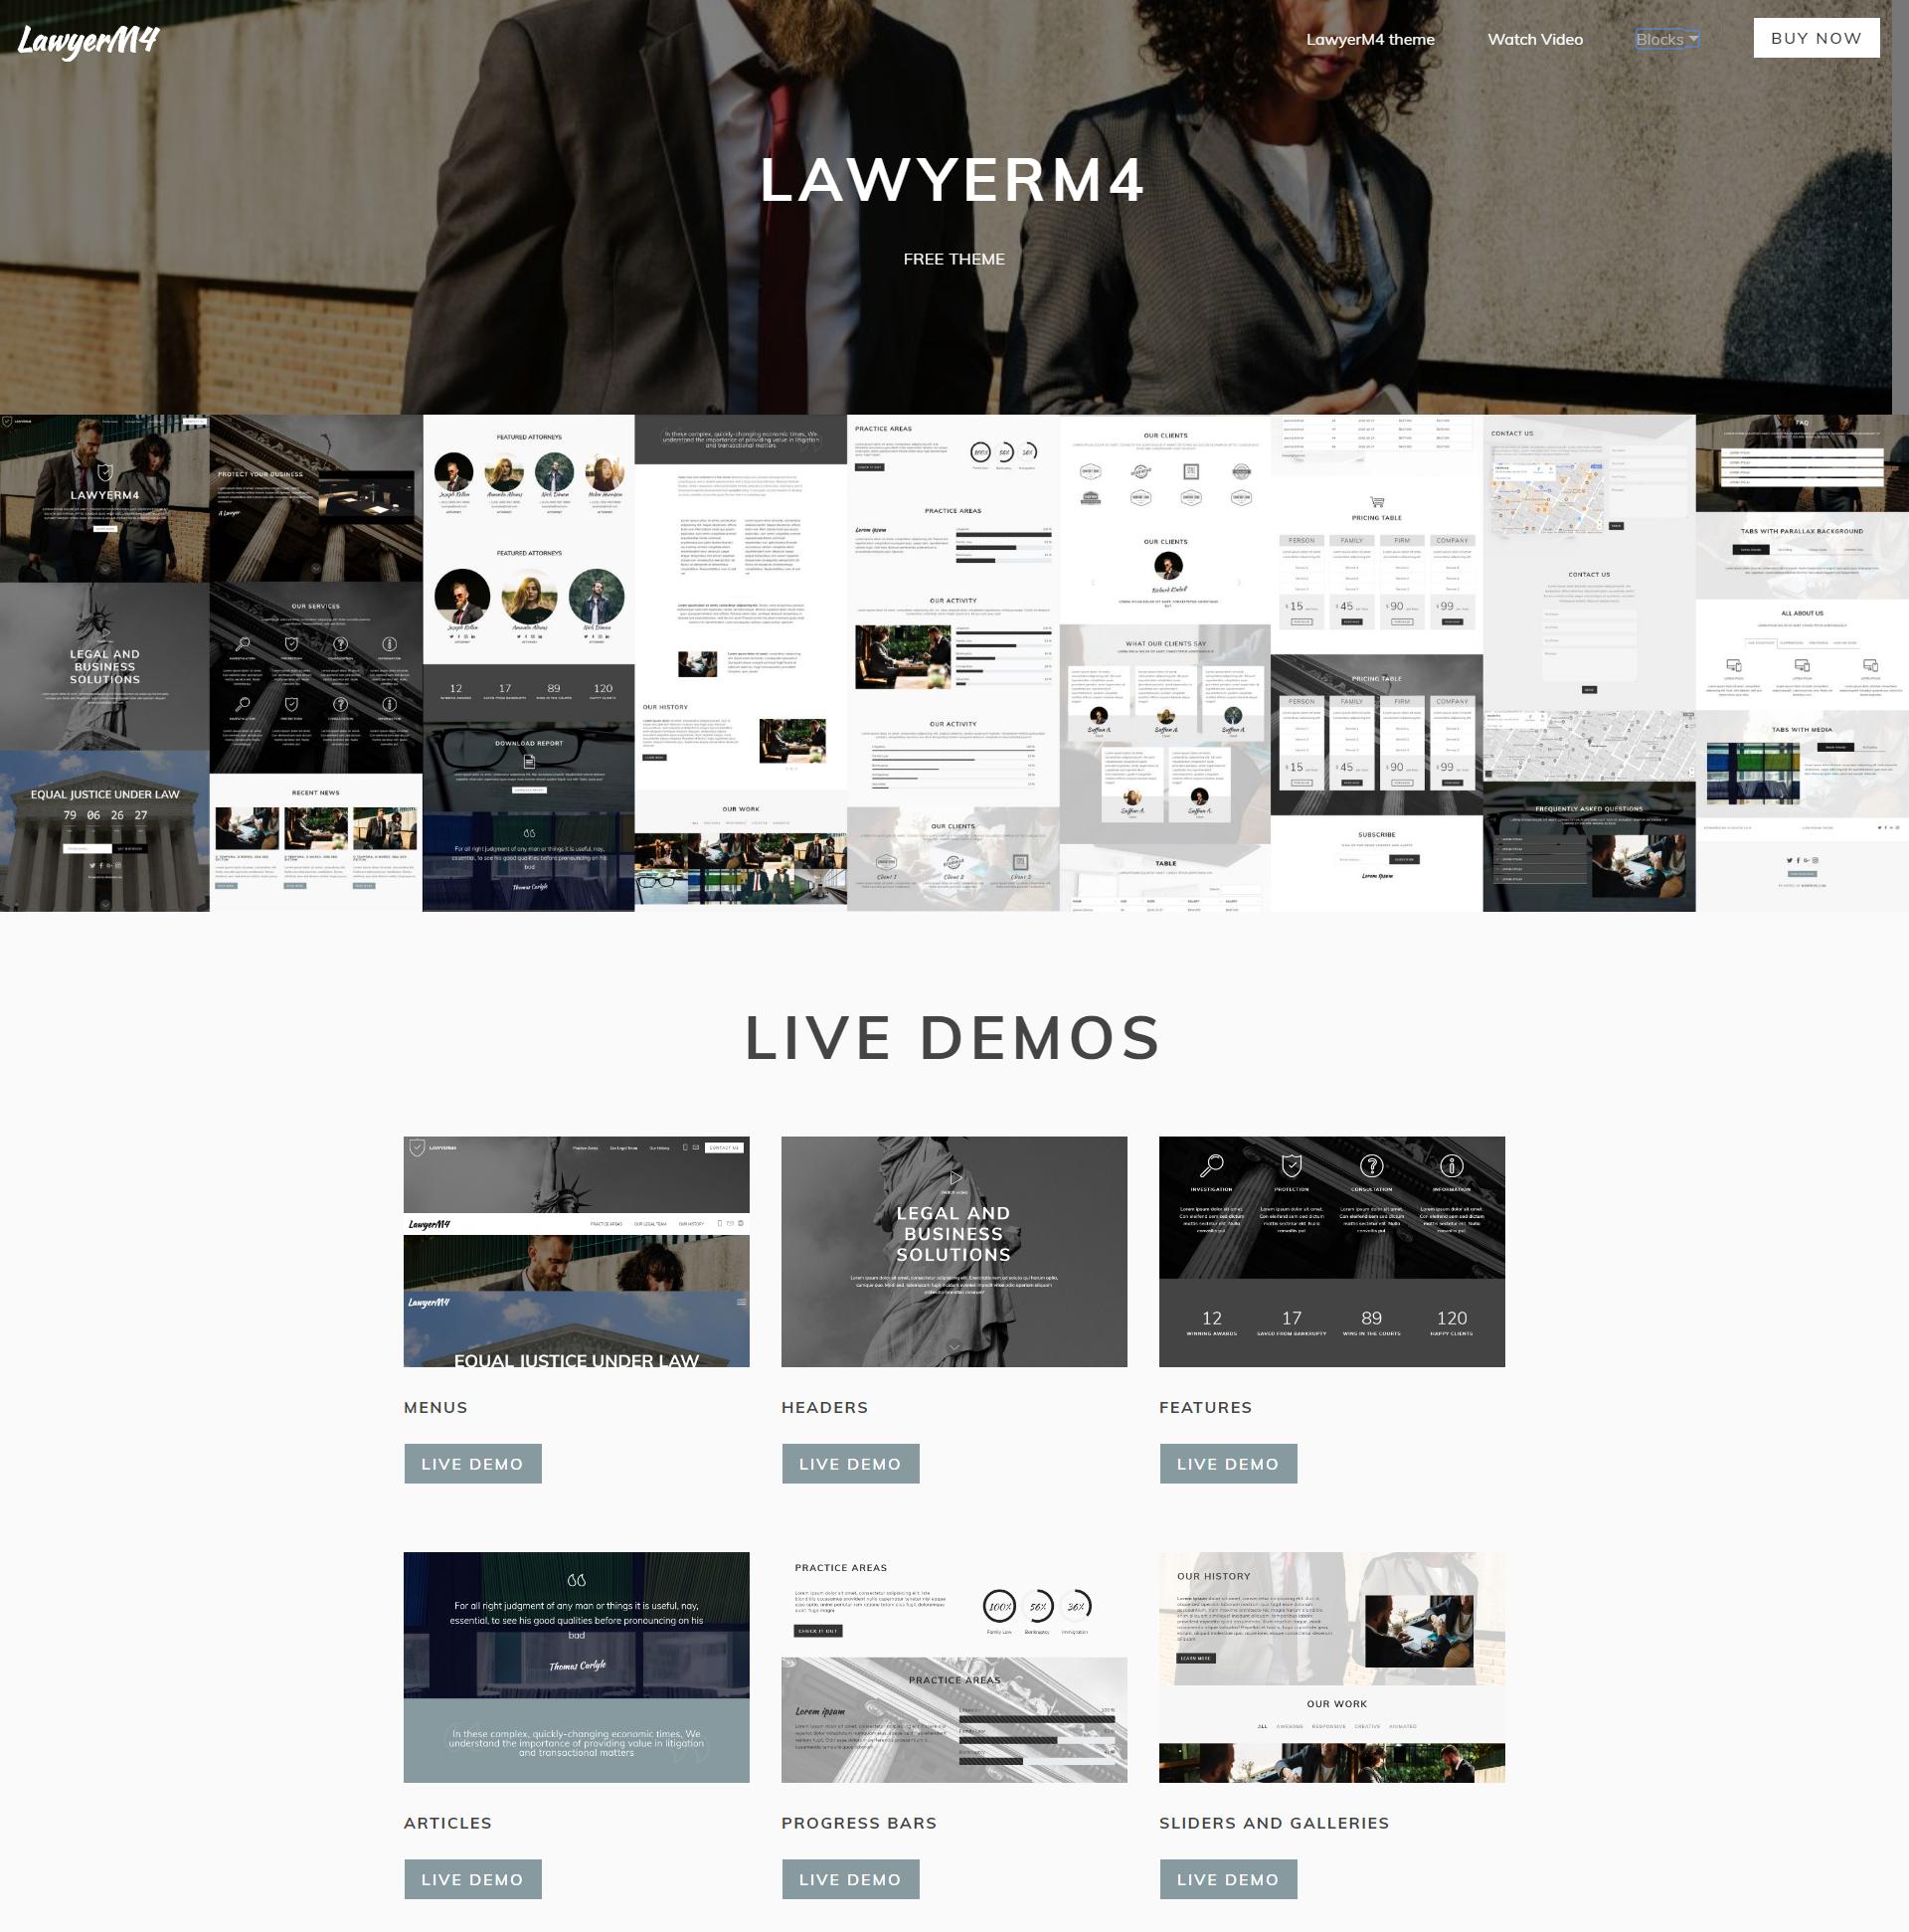 HTML Bootstrap LawyerM4 Templates